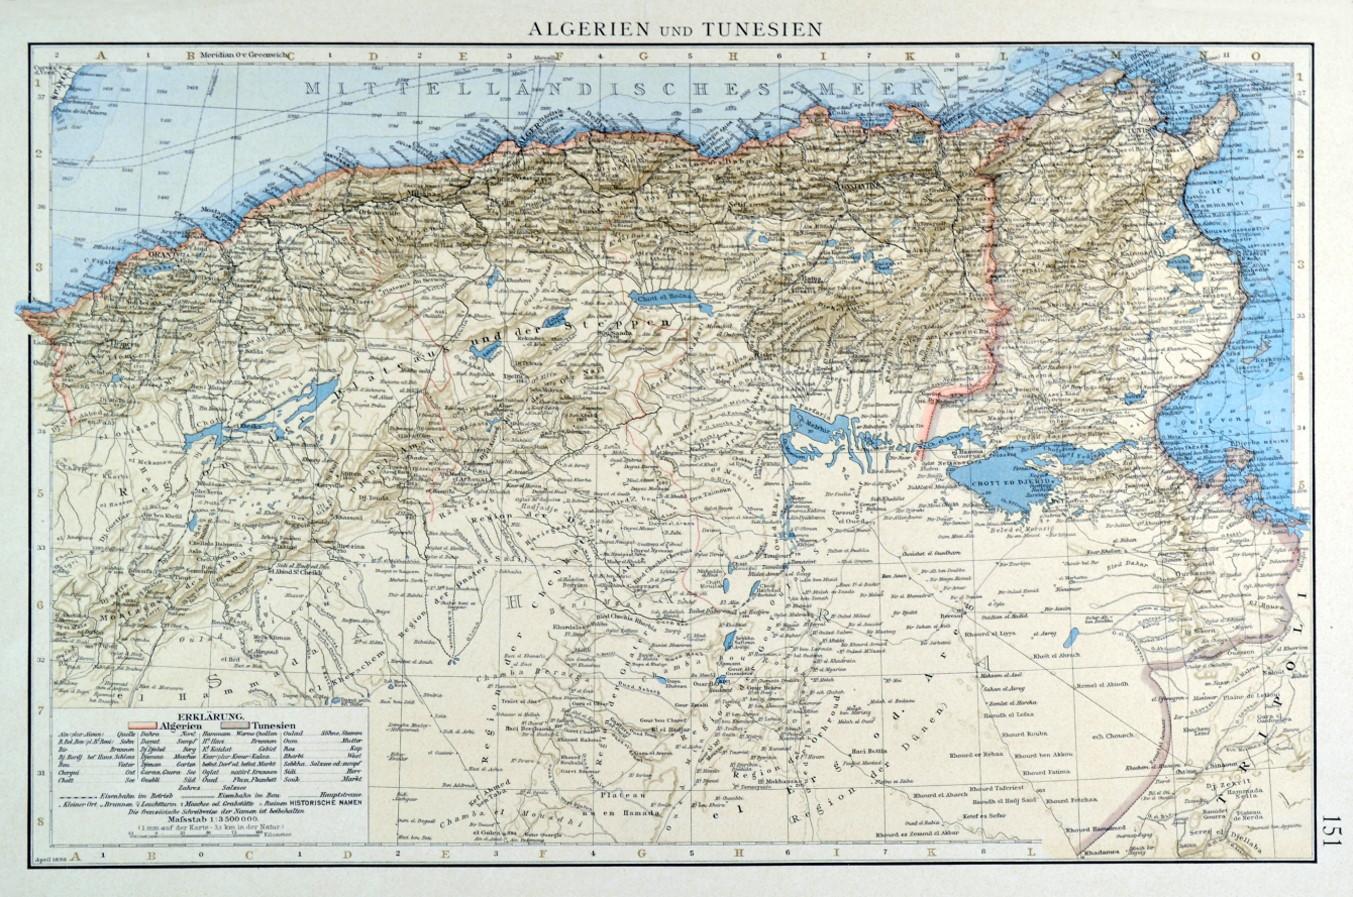 Tunesien Karte.Algerien Karte